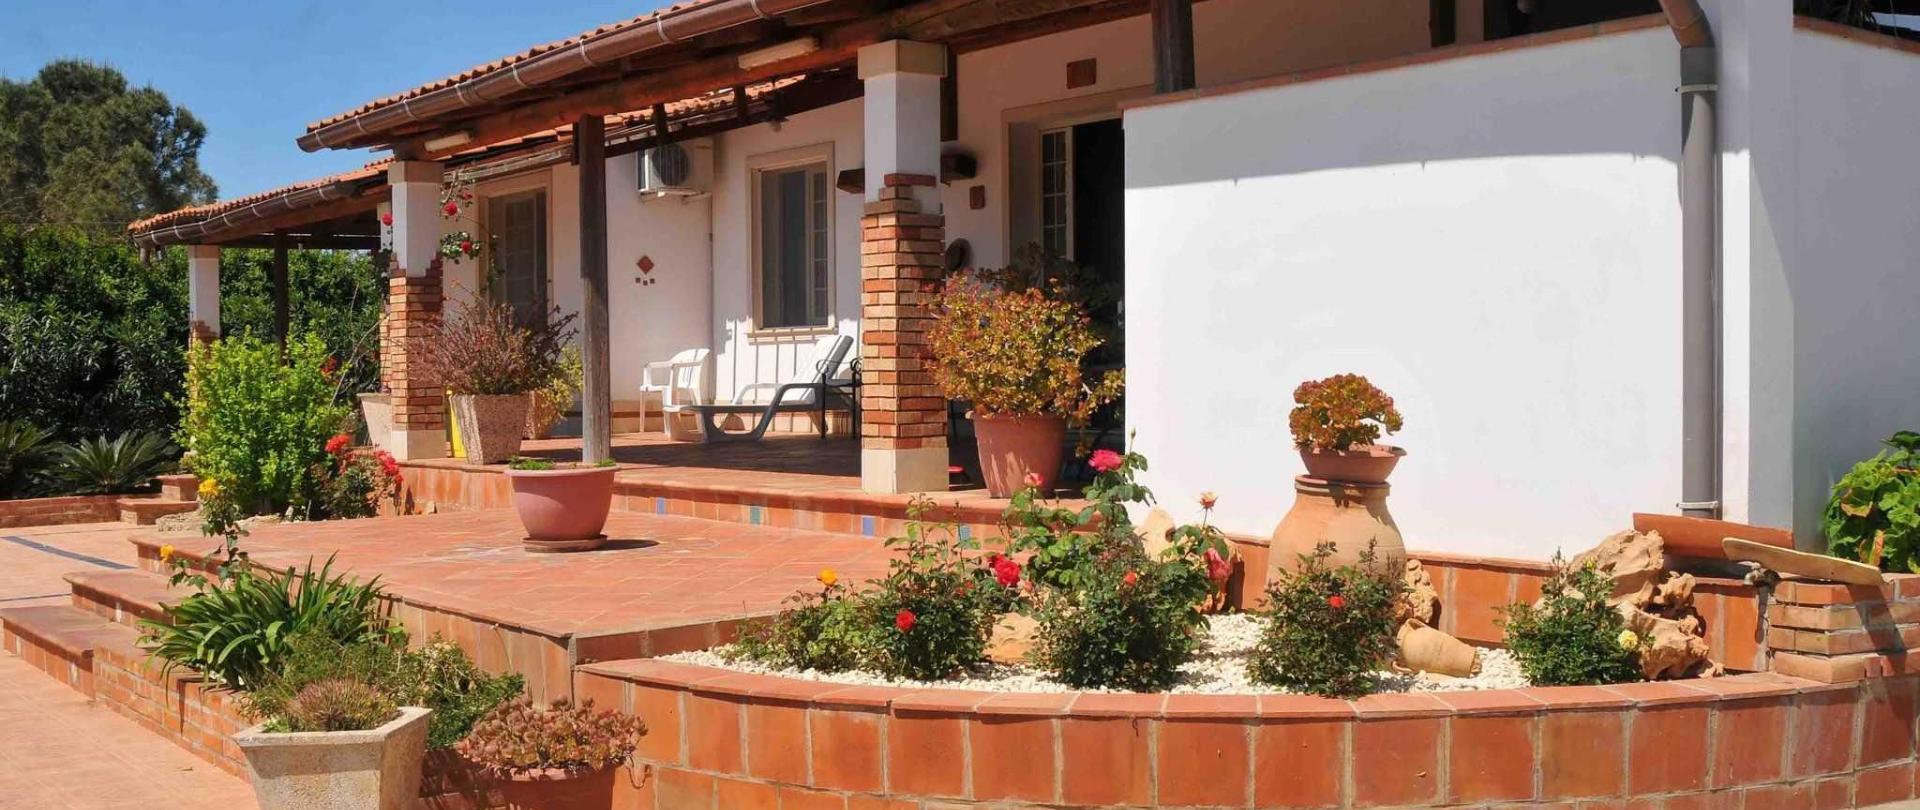 2_resort_noto_il_mandorleto_avola_villa_con_piscina_campagna_siciliana_23.JPG